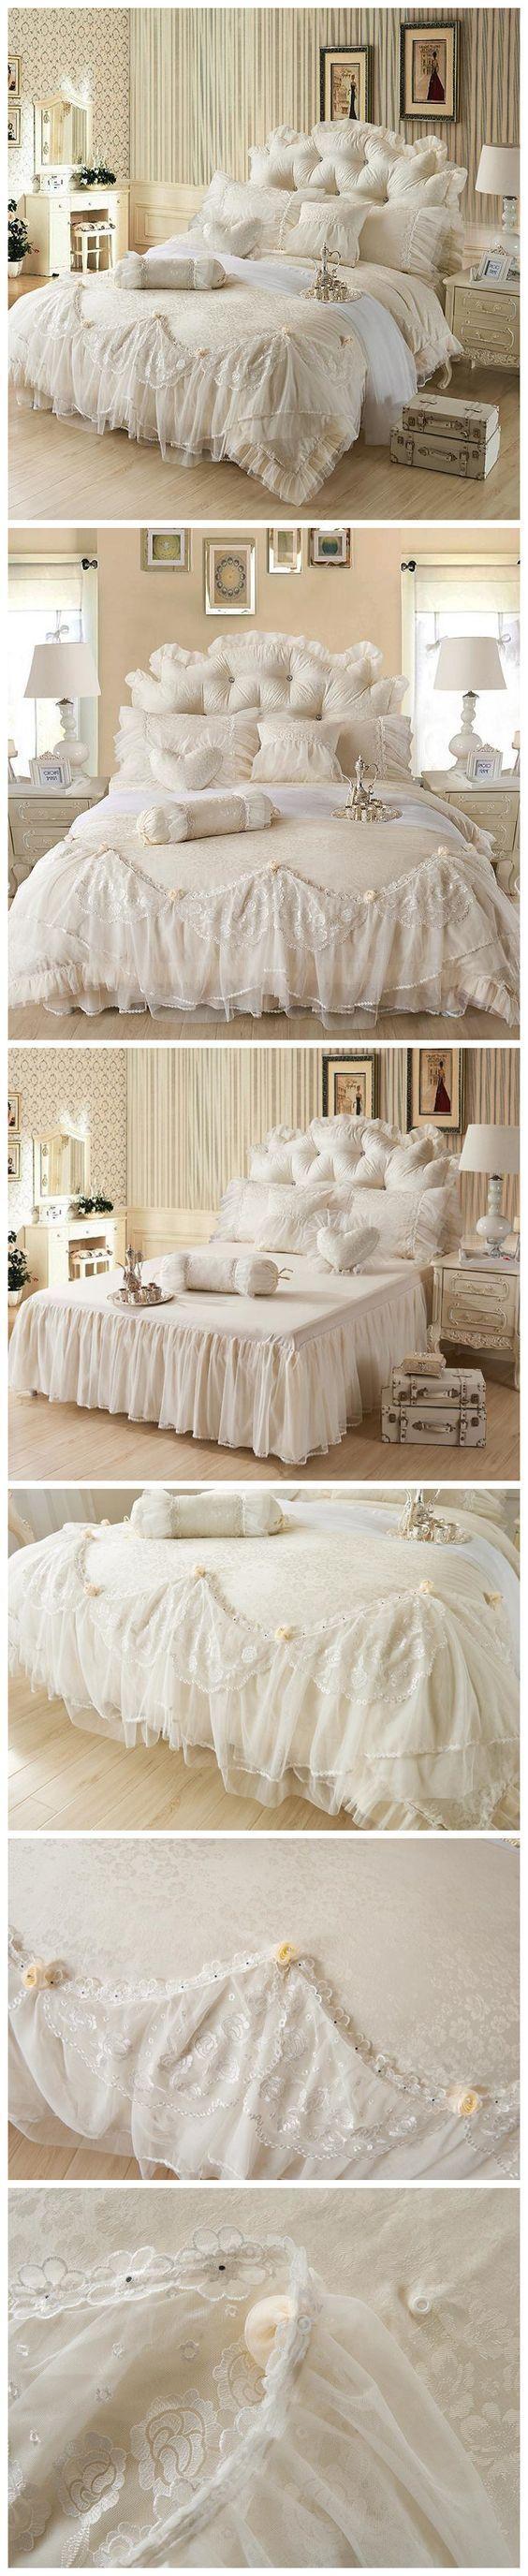 White Lace Ruffle Wedding Bedding Sets Queen Size Korean Princess Duvet Cover Sets Rose Comforter Sets 4 Piece